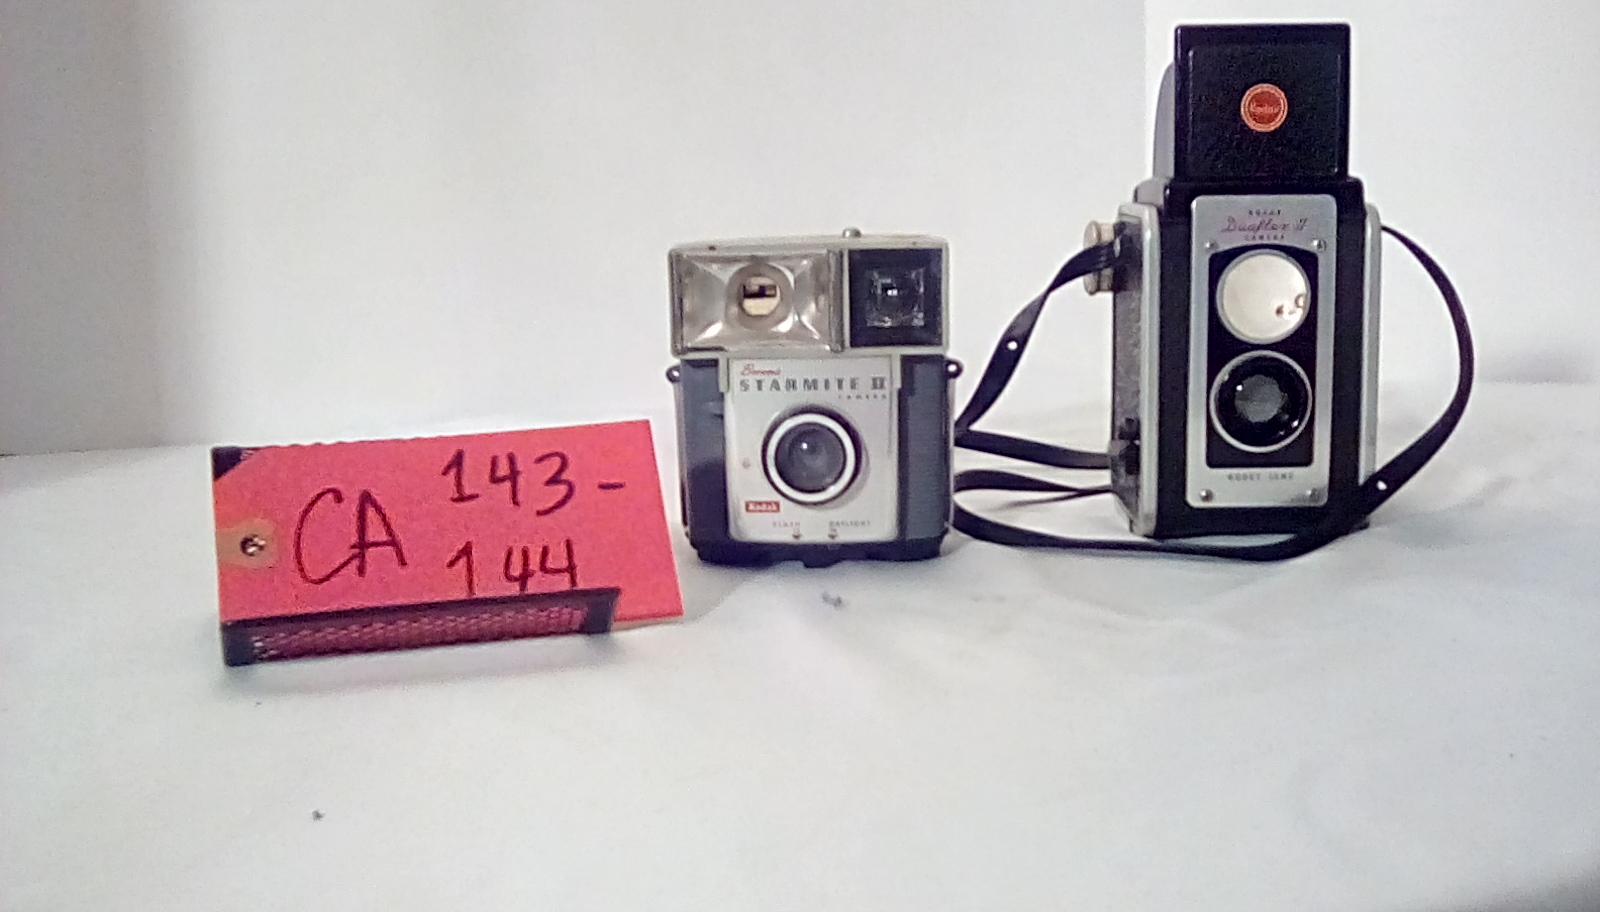 CA143 Brownie Starmite 3, CA144 Kodak duaflex w/formed leather case